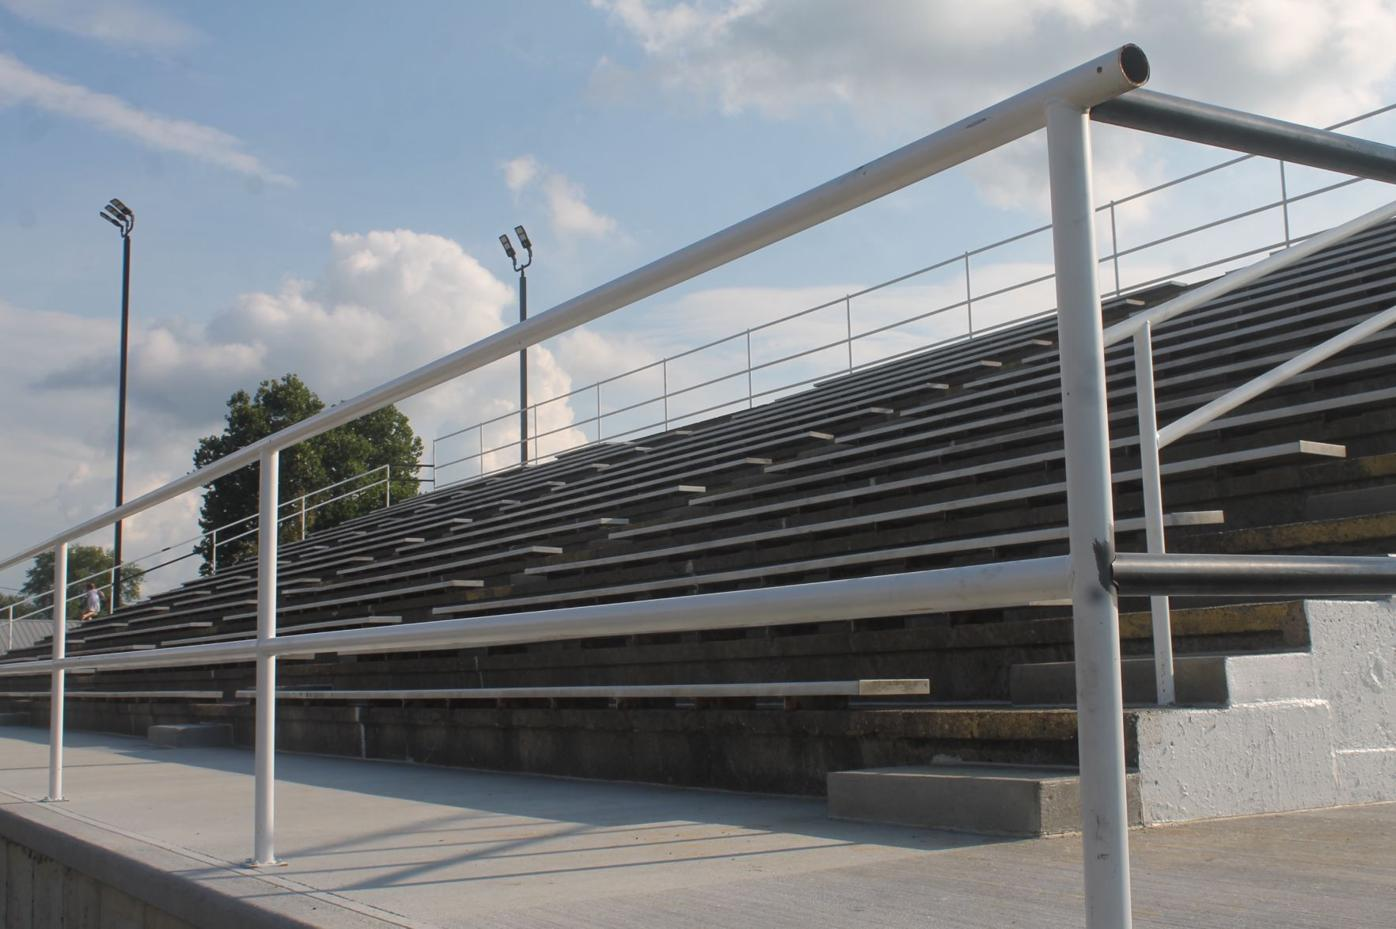 new grandstand